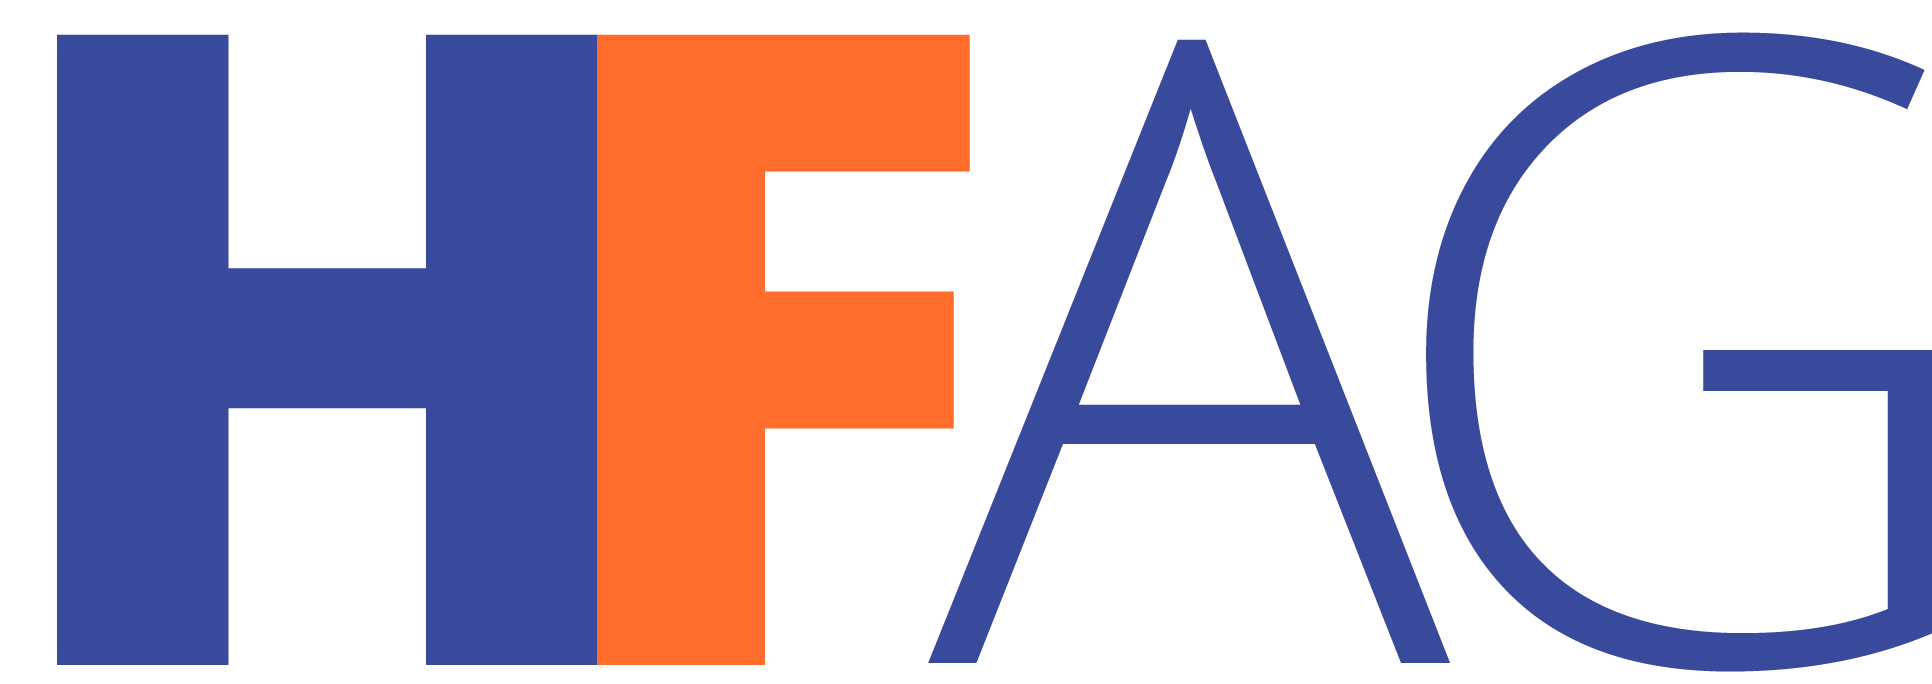 HFAG-logo